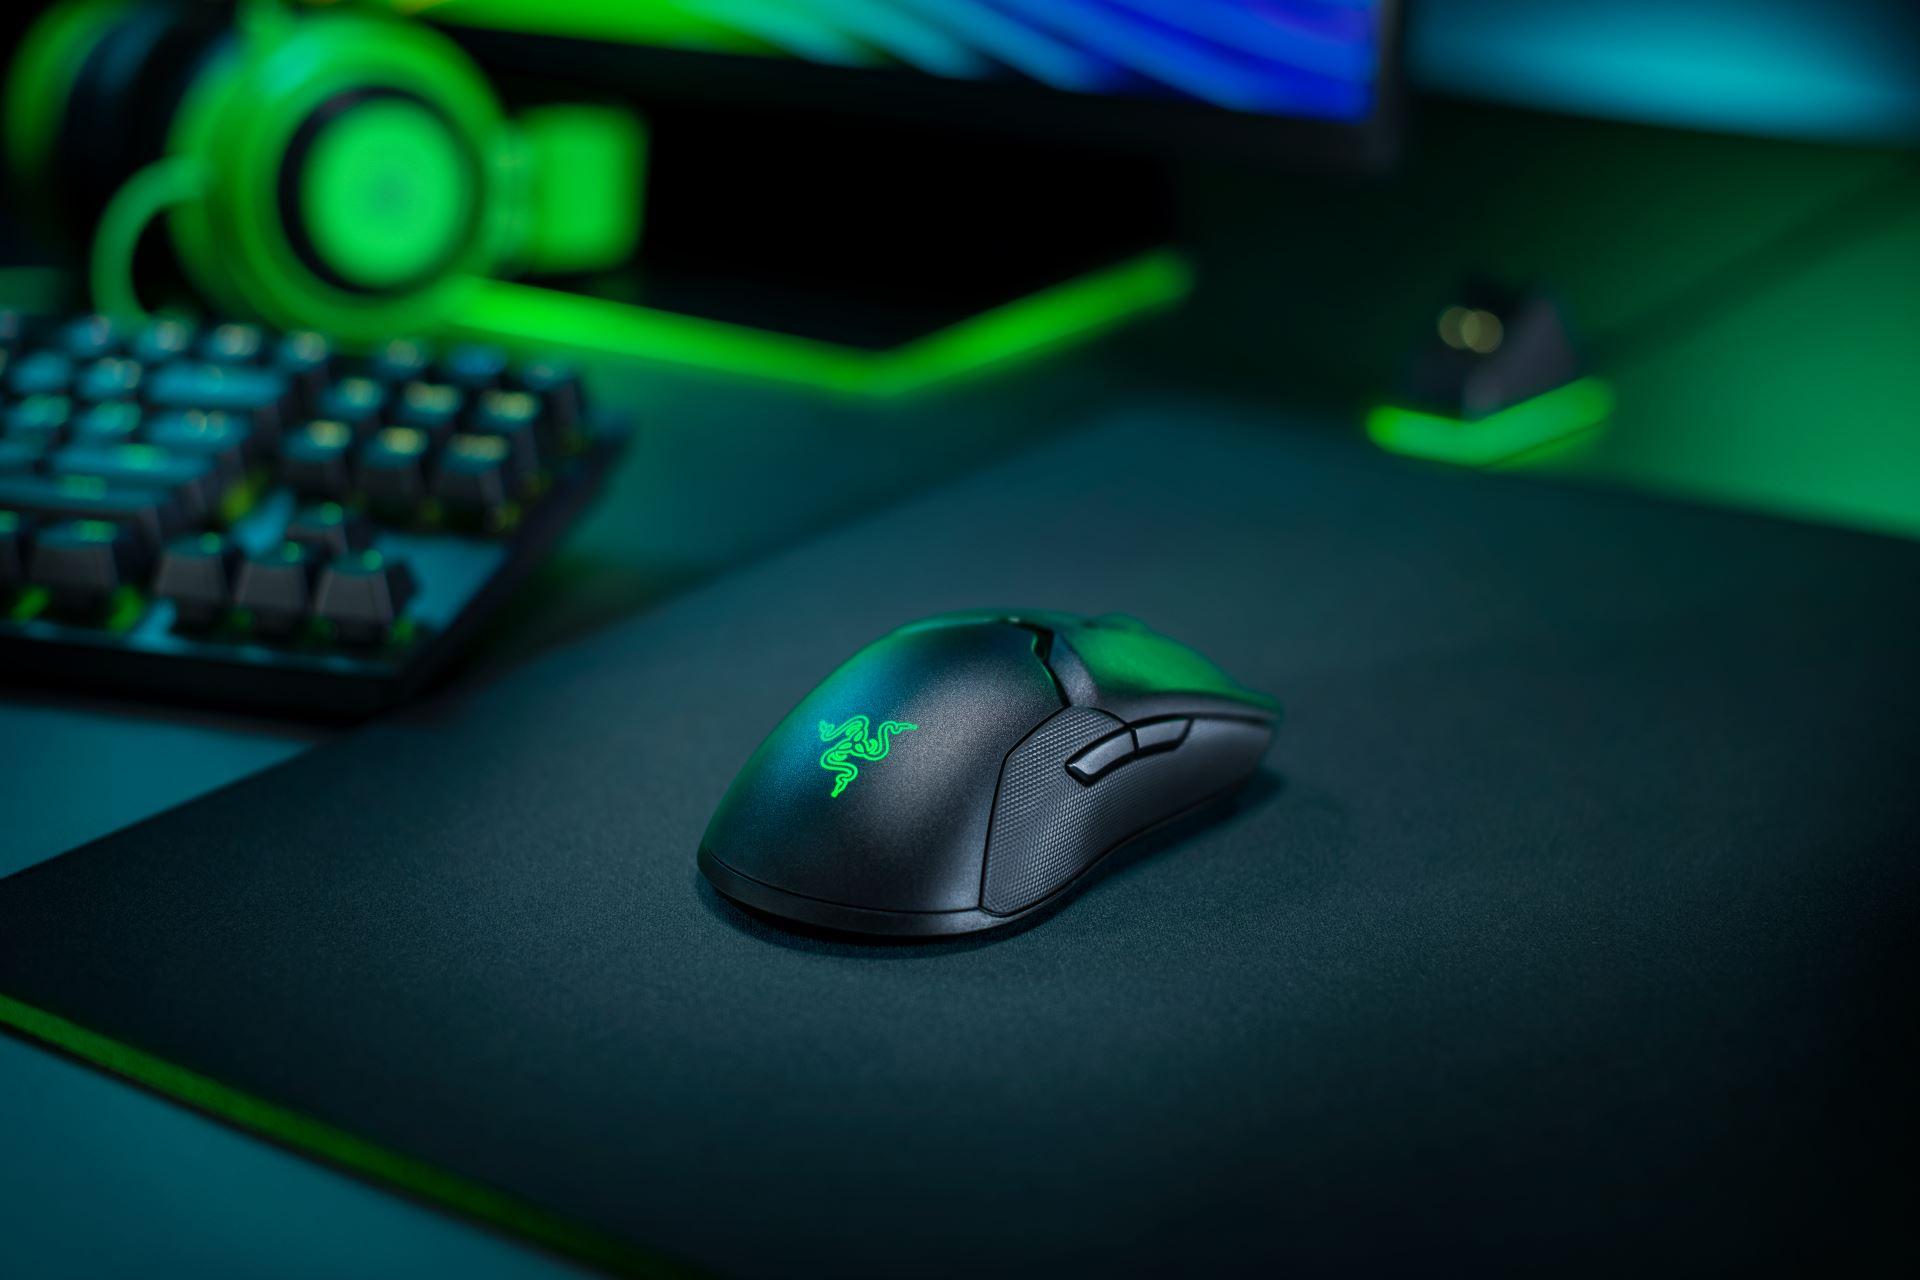 Анонсирована беспроводная мышь Razer Viper Ultimate